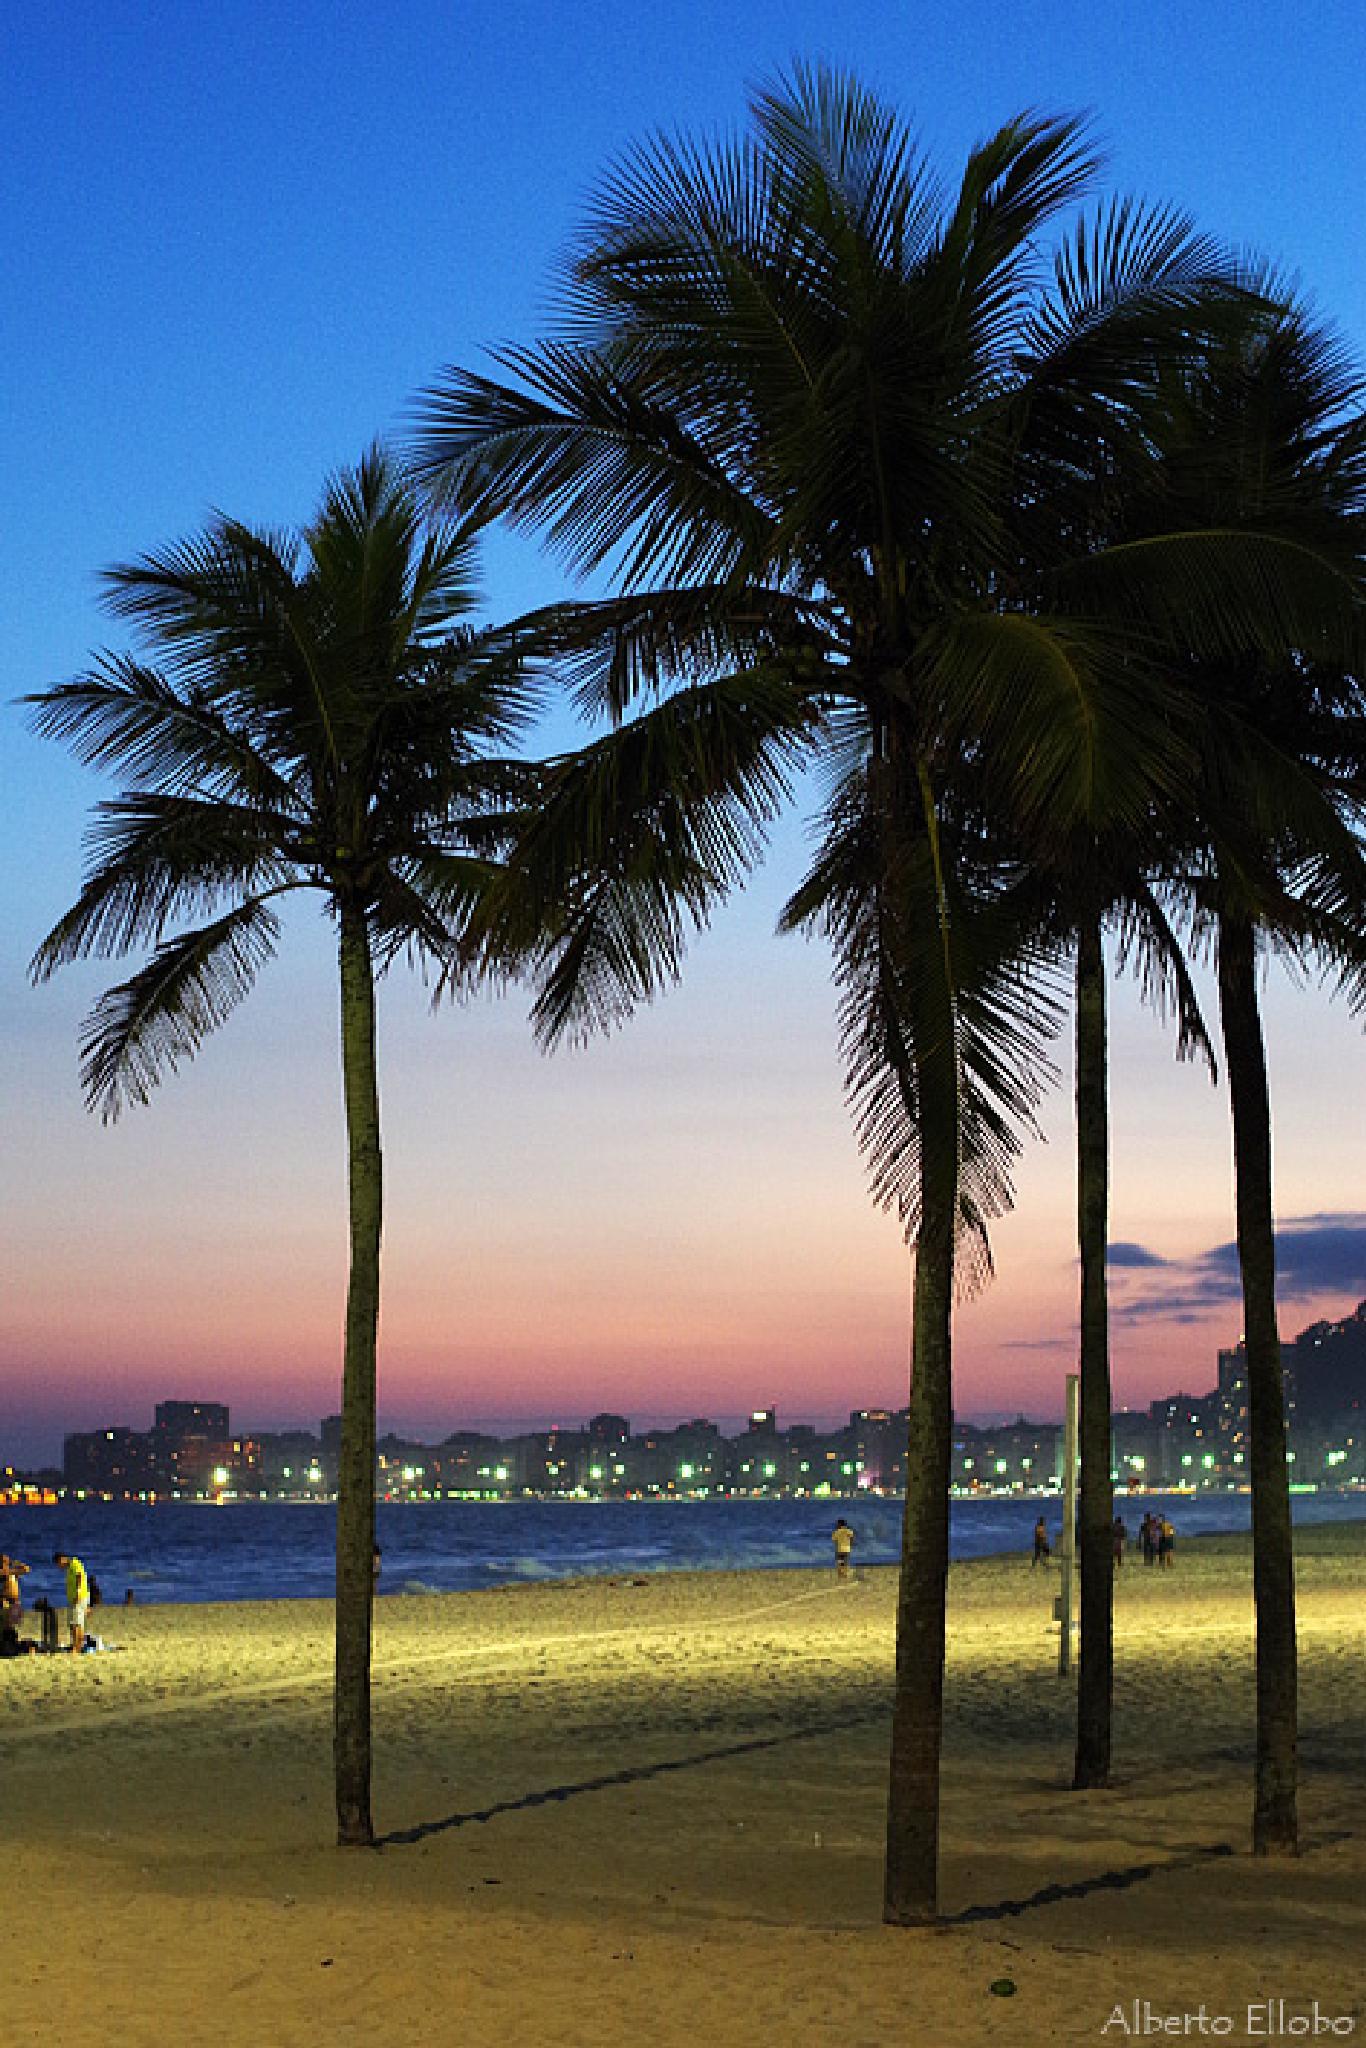 Nightfall in Copacabana Beach by AlbertoEllobo